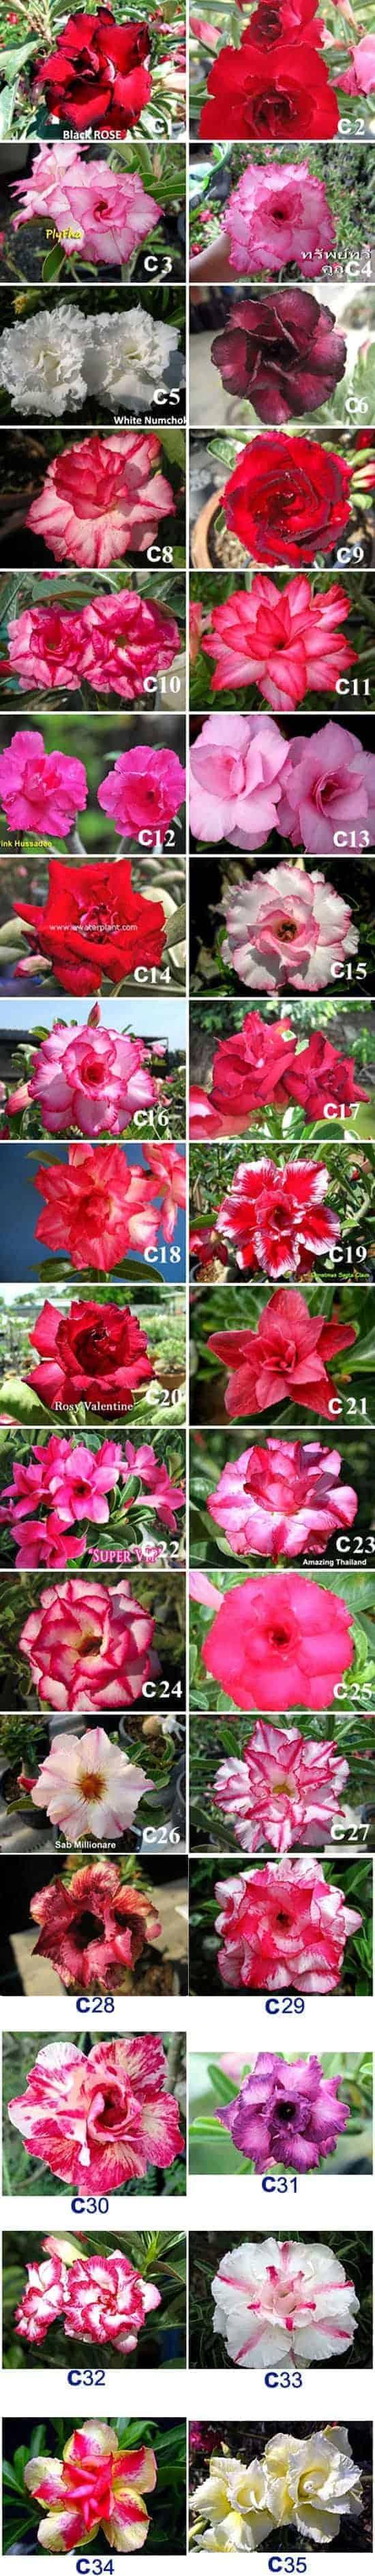 Adenium rosy flower group C